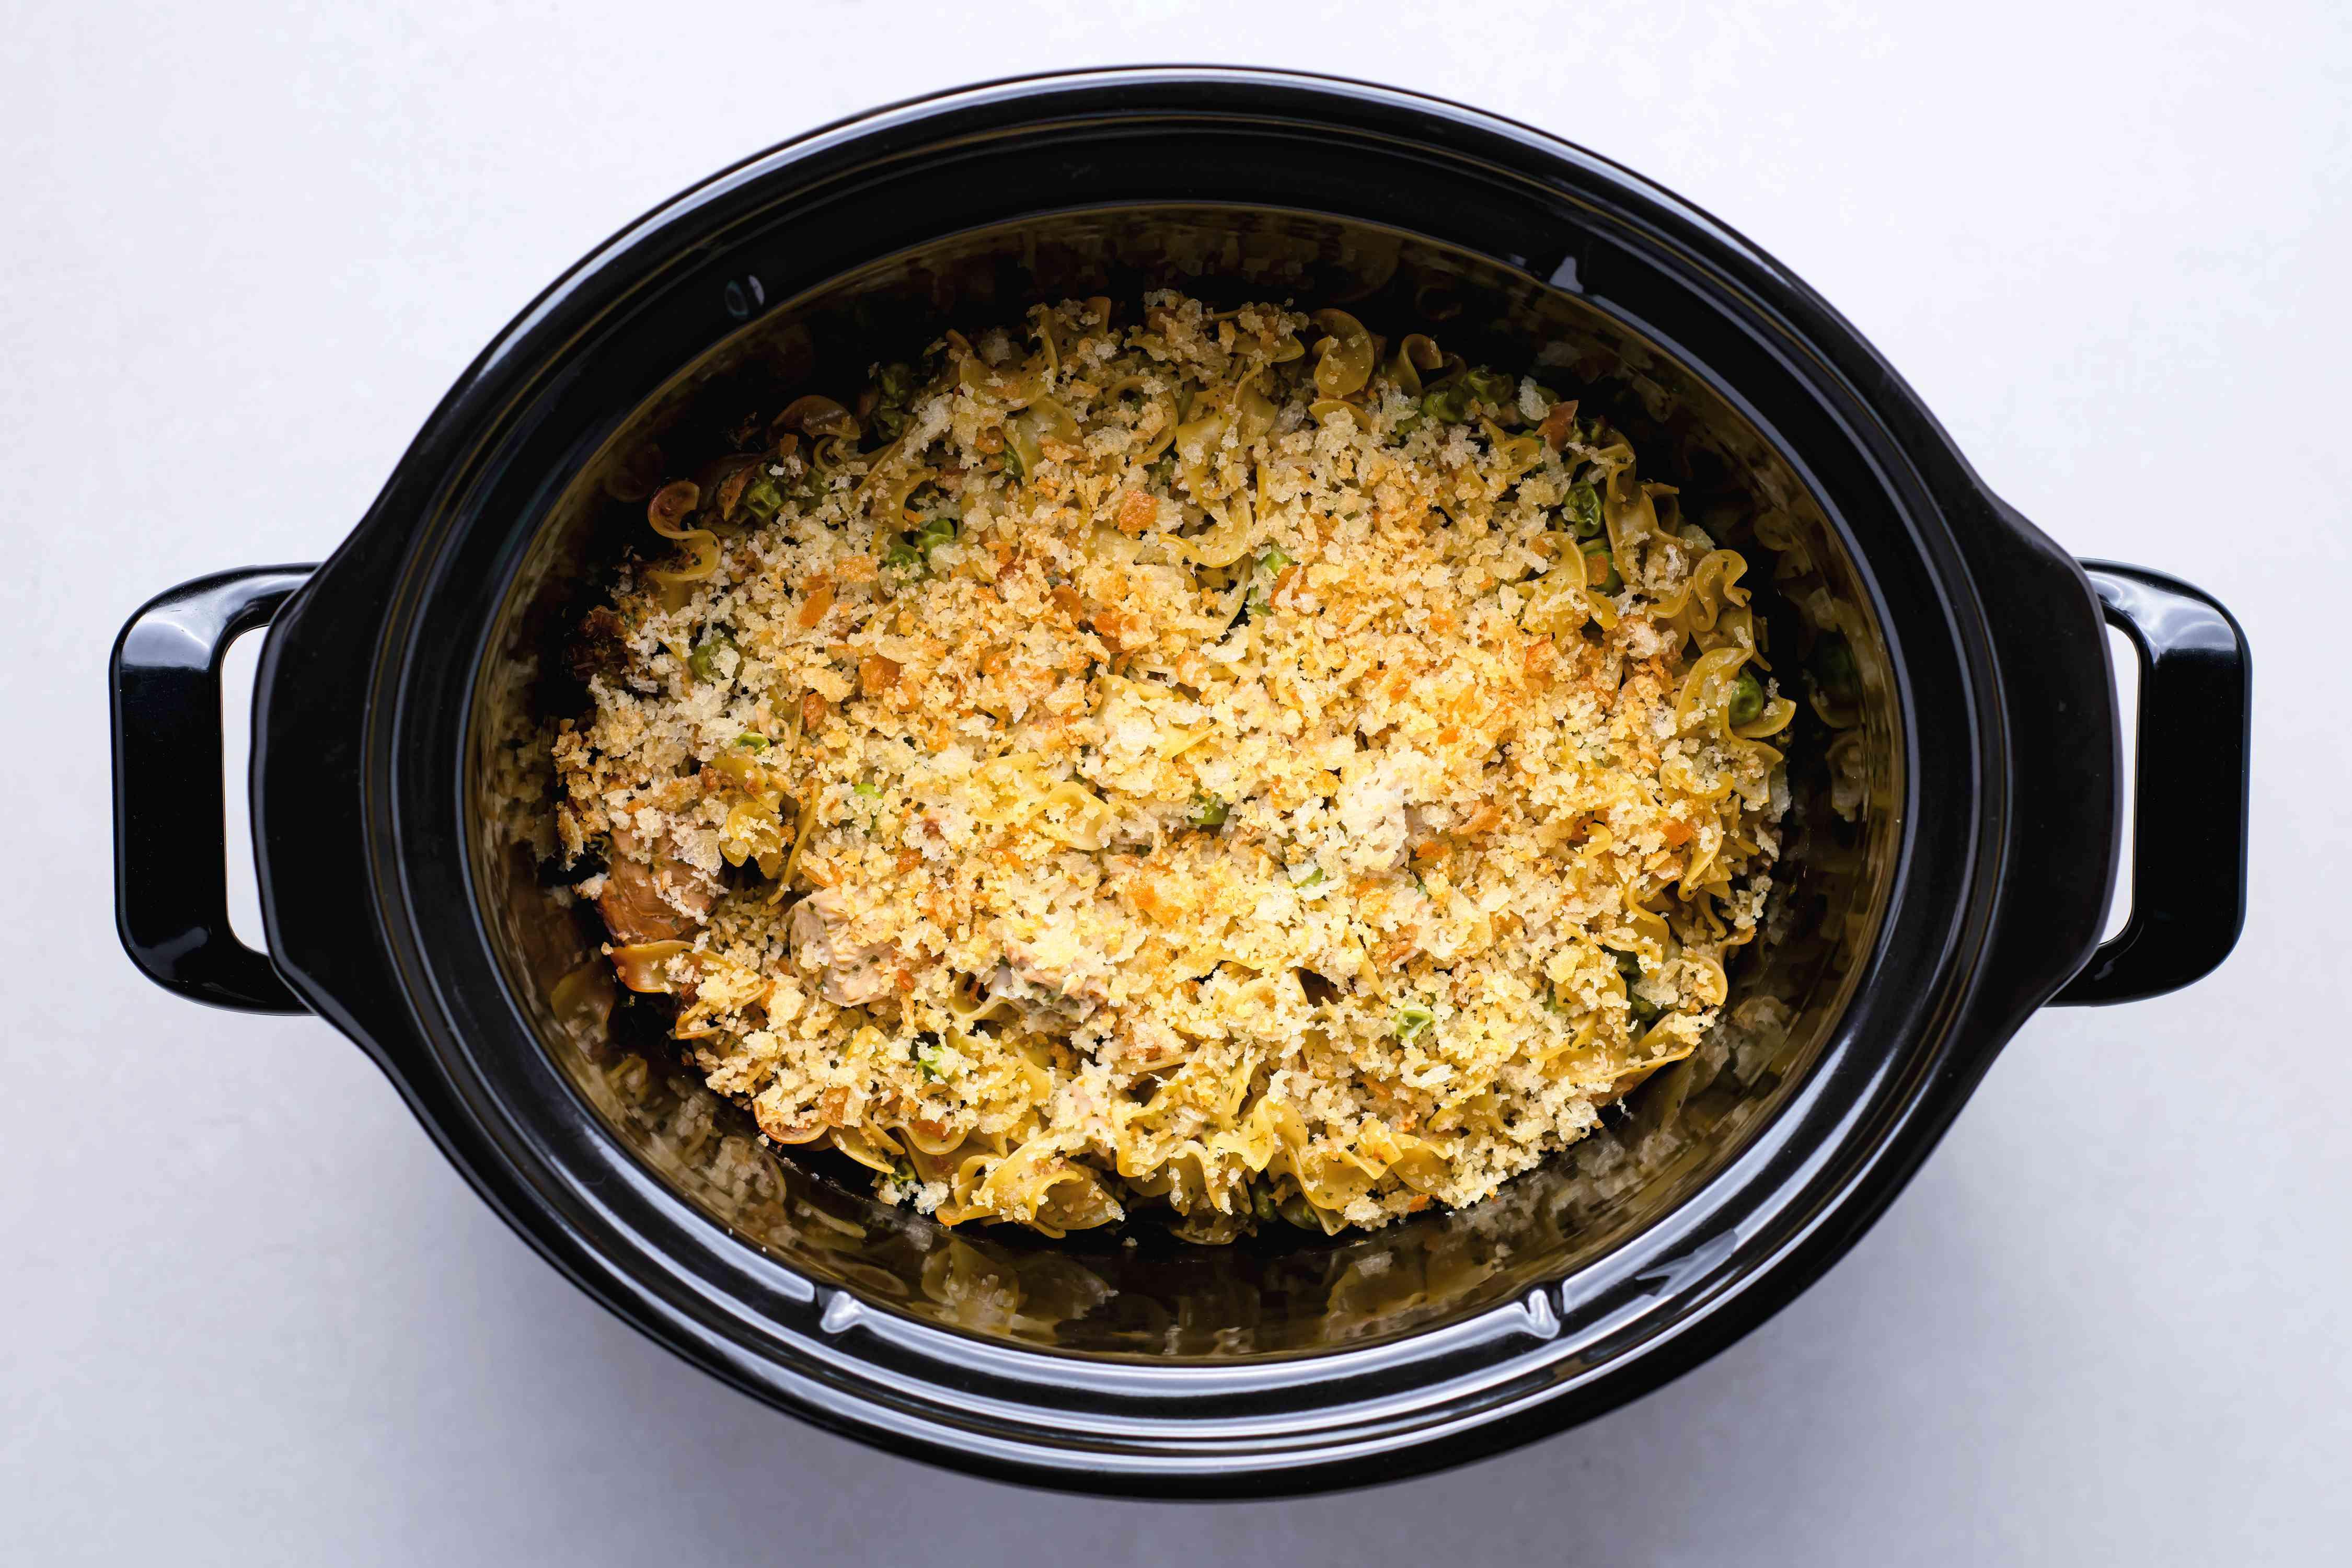 Crock Pot Tuna Casserole